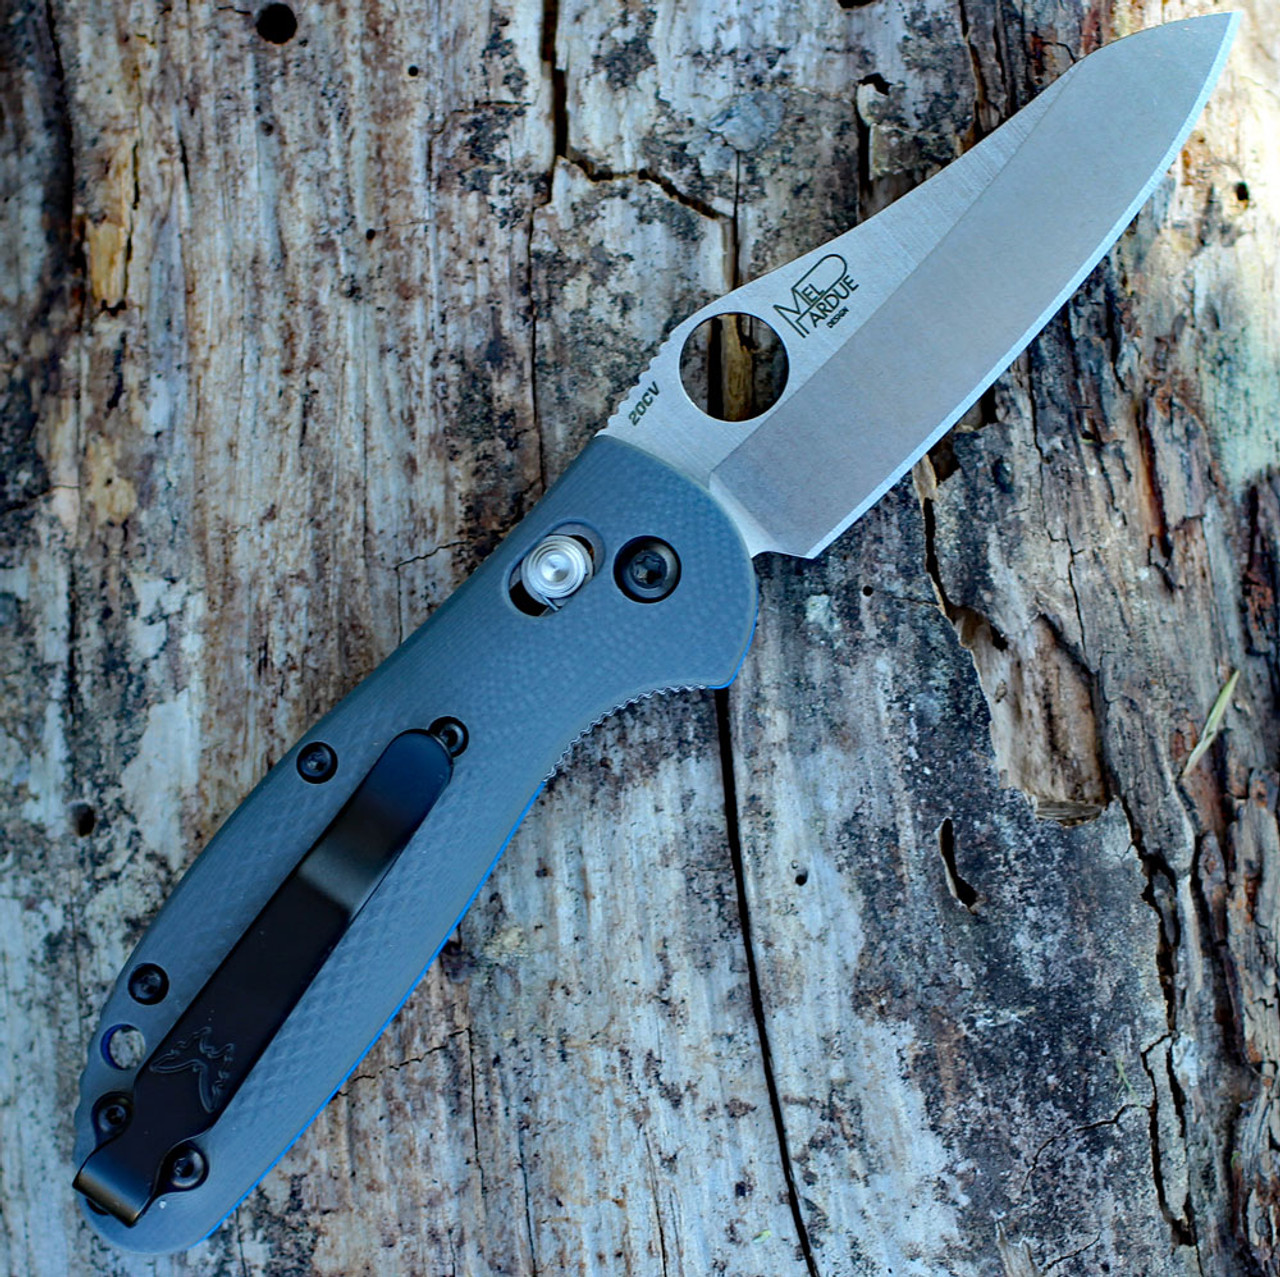 Benchmade G10 Mini Griptilian 555-1, 2.91 in. CPM-20CV Stainless, Plain Edge-Discontinued